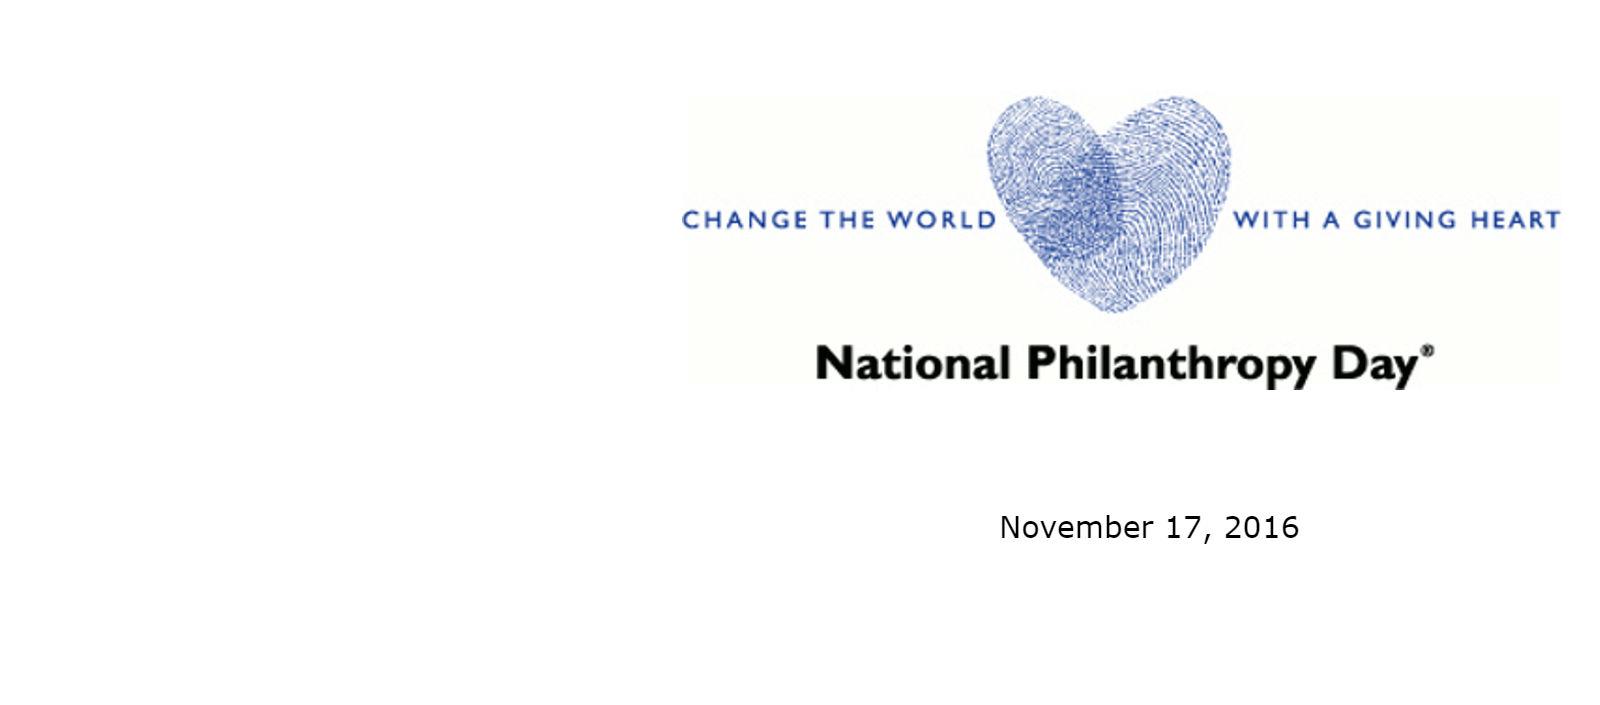 National Philanthropy Day 2016